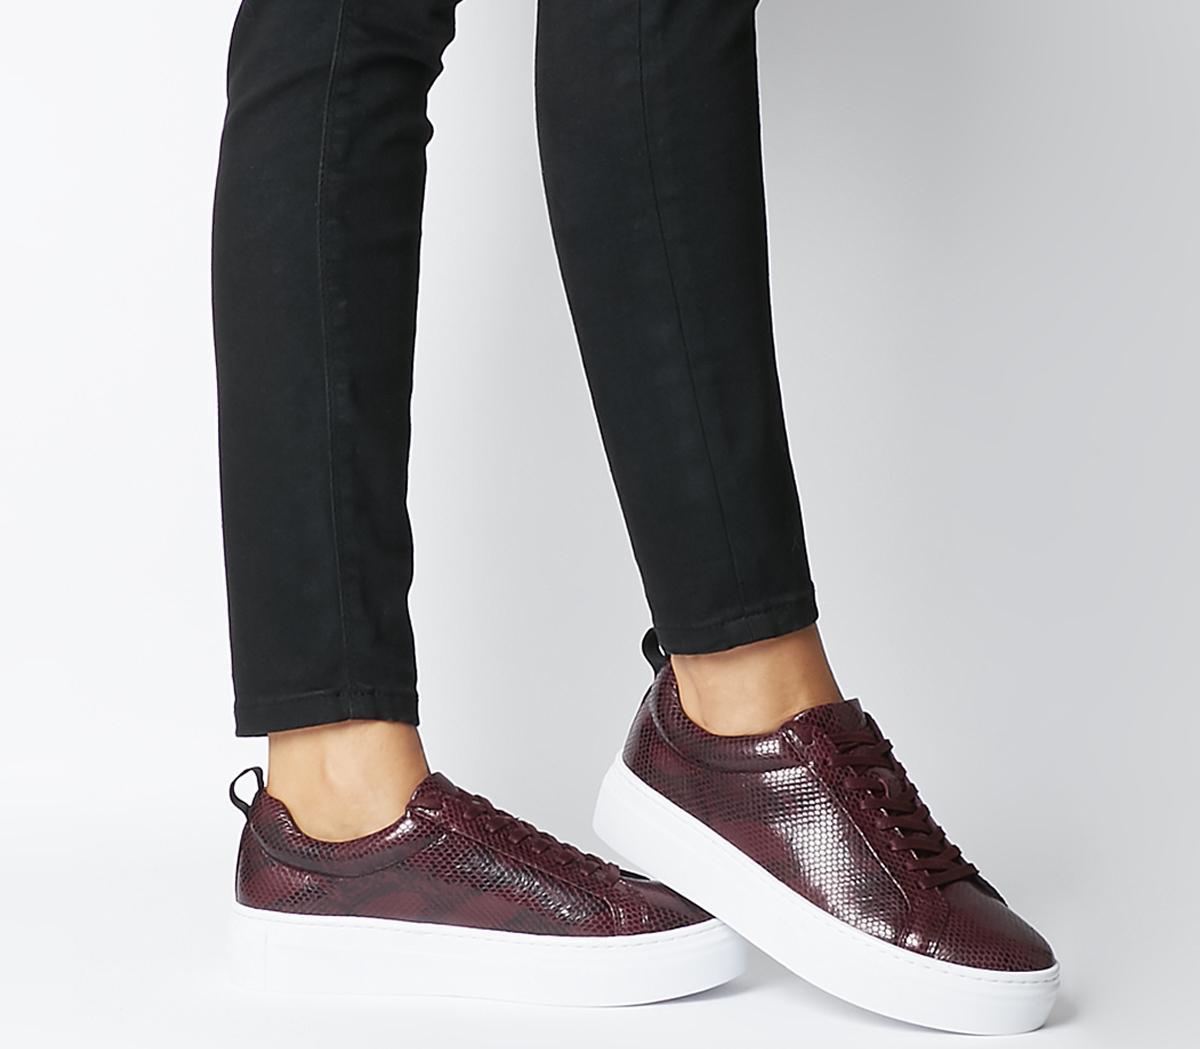 Vagabond Zoe Platform Sneakers Wine